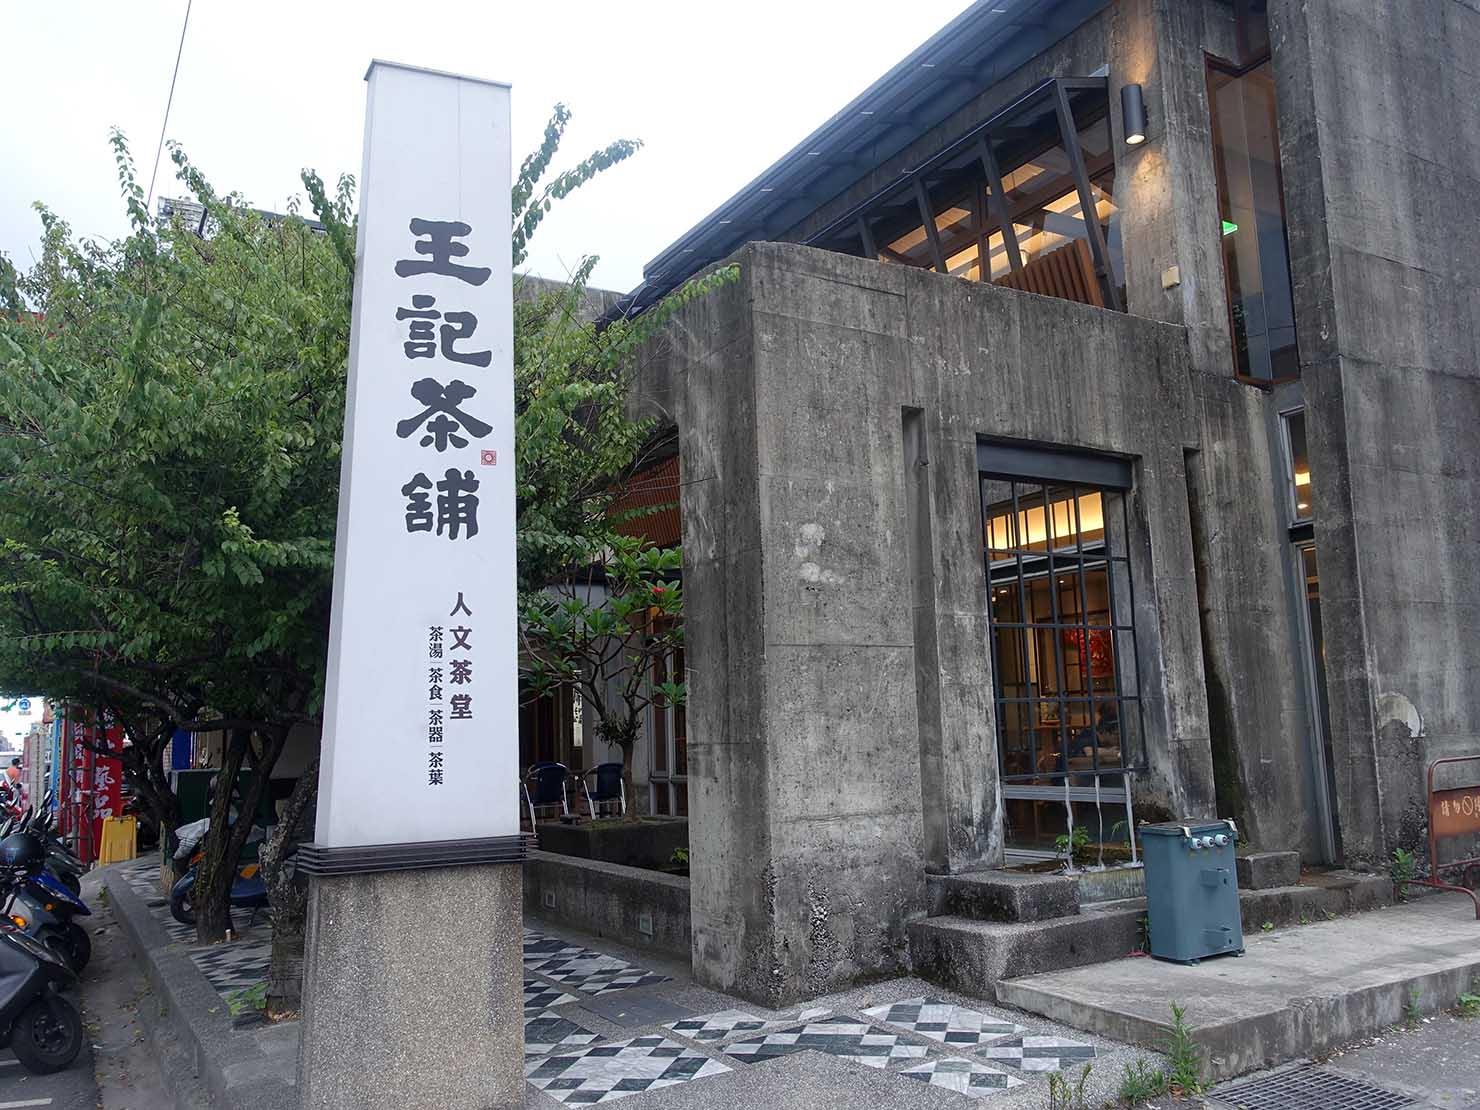 KKday外国人限定「花蓮・太魯閣(タロコ)日帰りツアー」夕食で立ち寄った王記茶舖